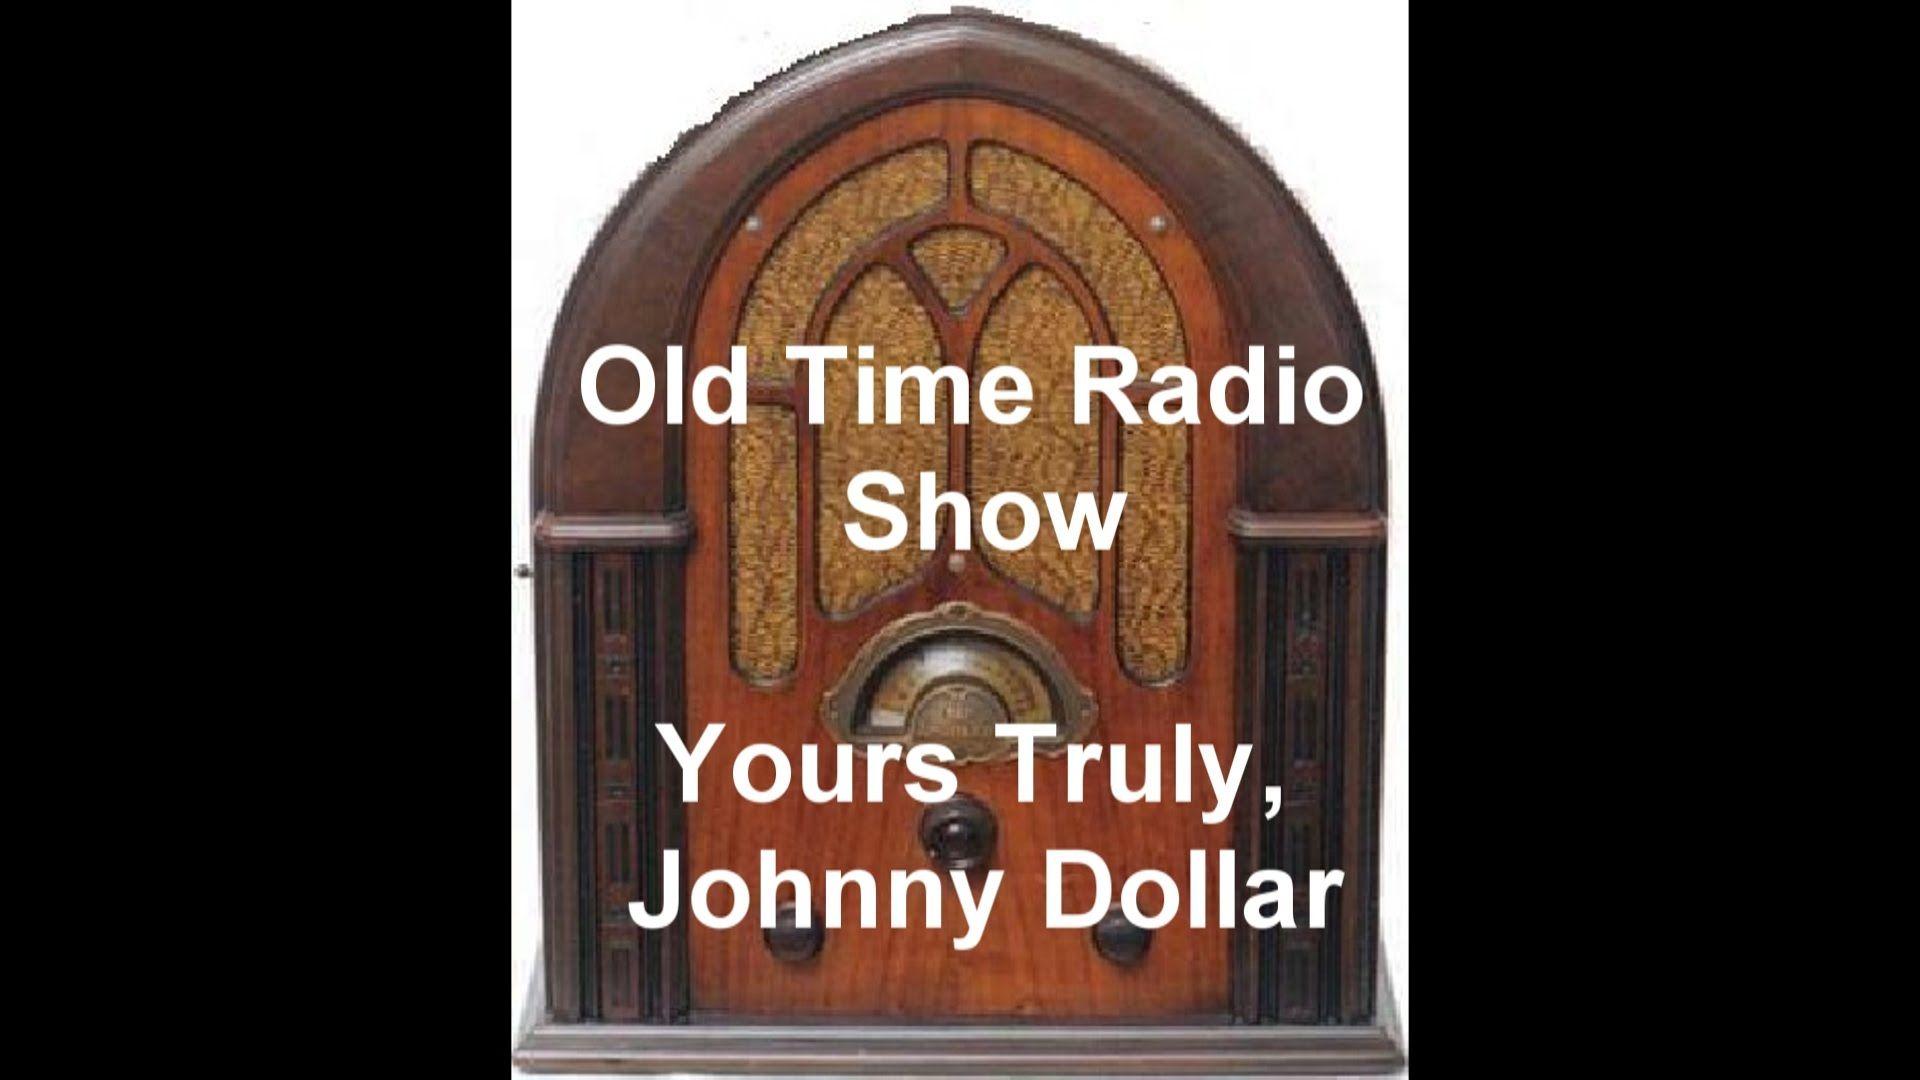 Johnny Dollar Radio Show The Henderson Matter 1 Otr Old Time Radio Old Time Radio Radio Cbs Radio Mystery Theater